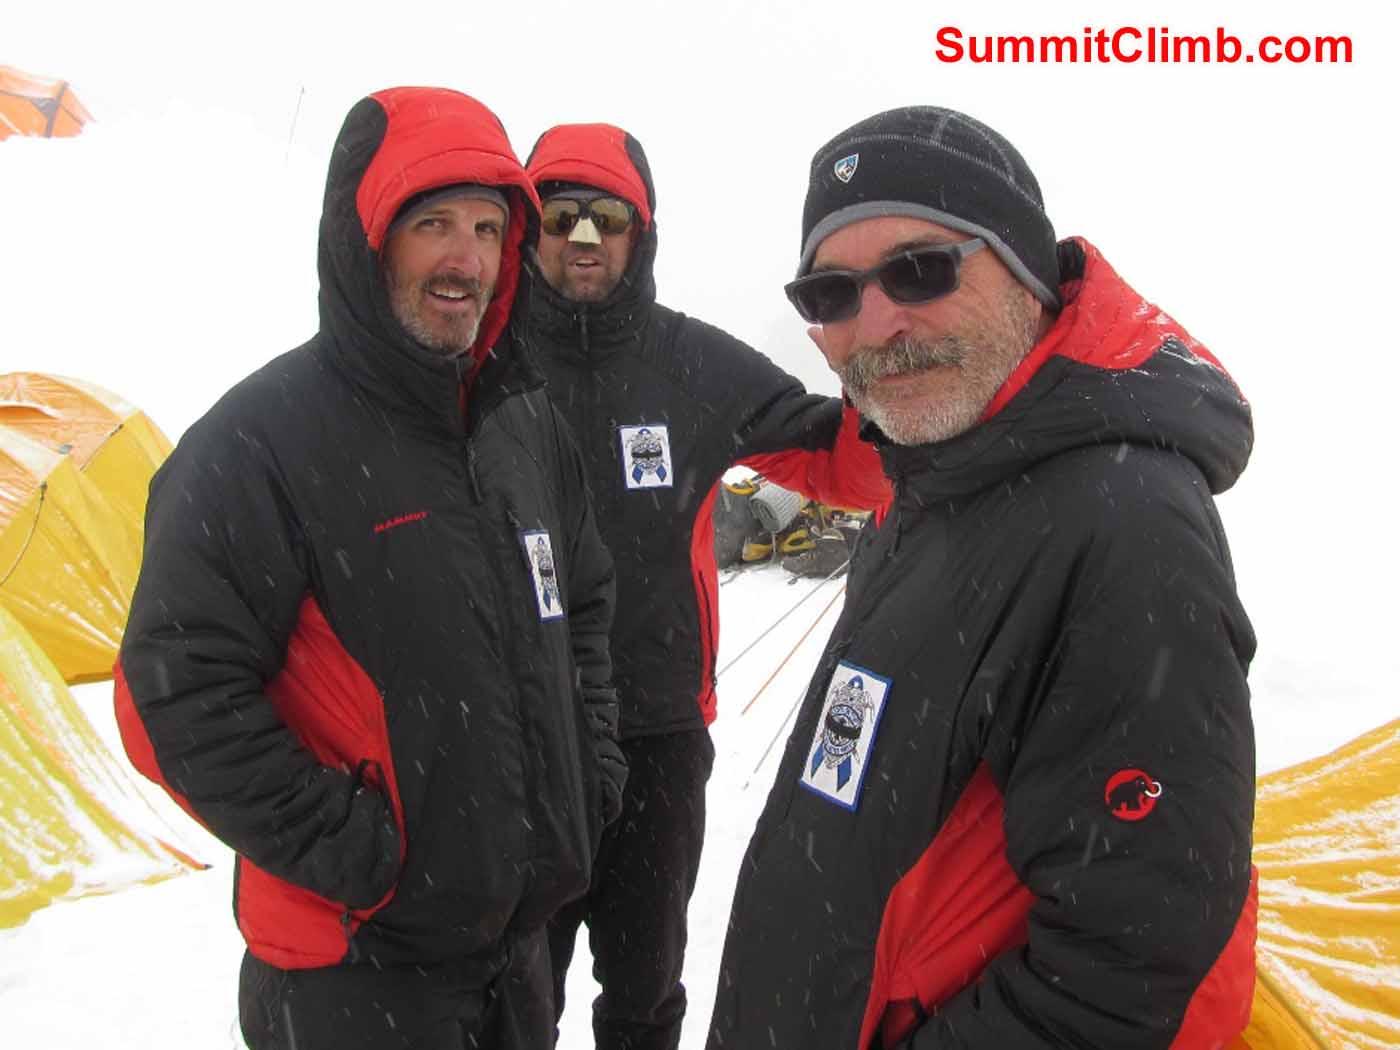 Stu Frink, Steve Janke and kaley Erickson at Camp 1 by Troy Bacon